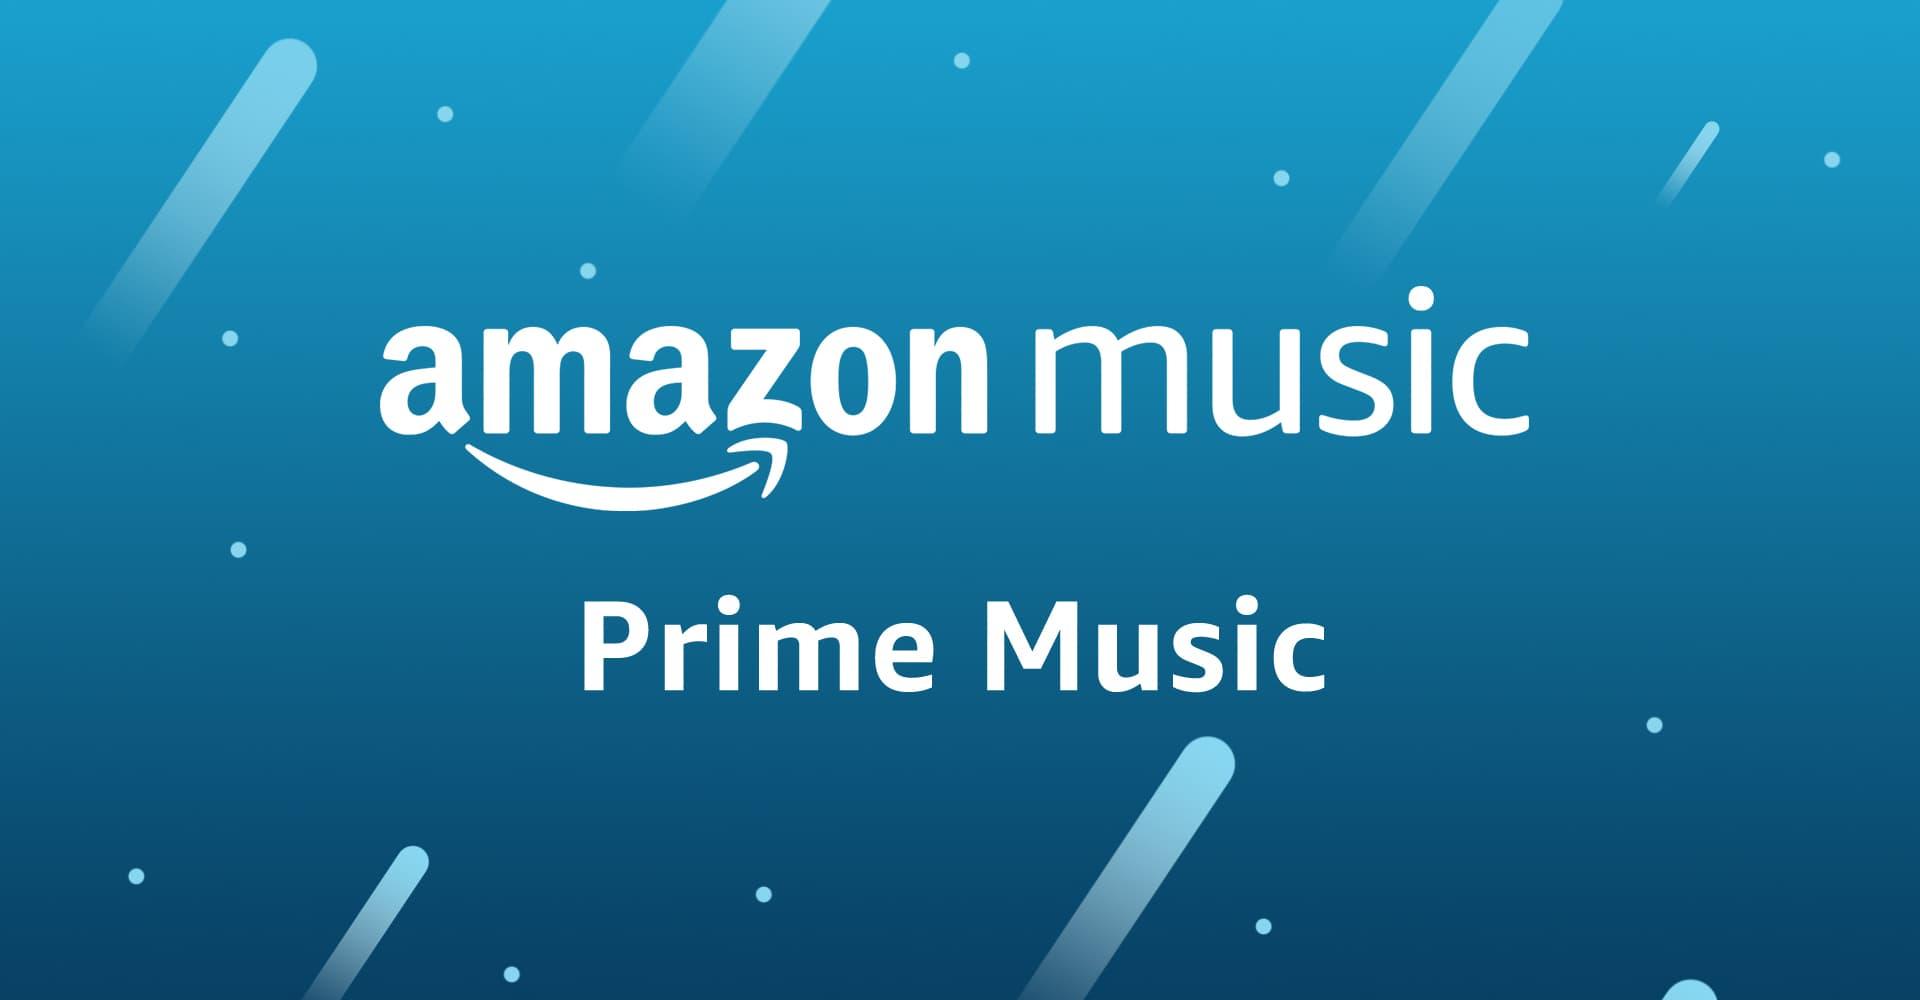 Amazon Music per Android e iOS